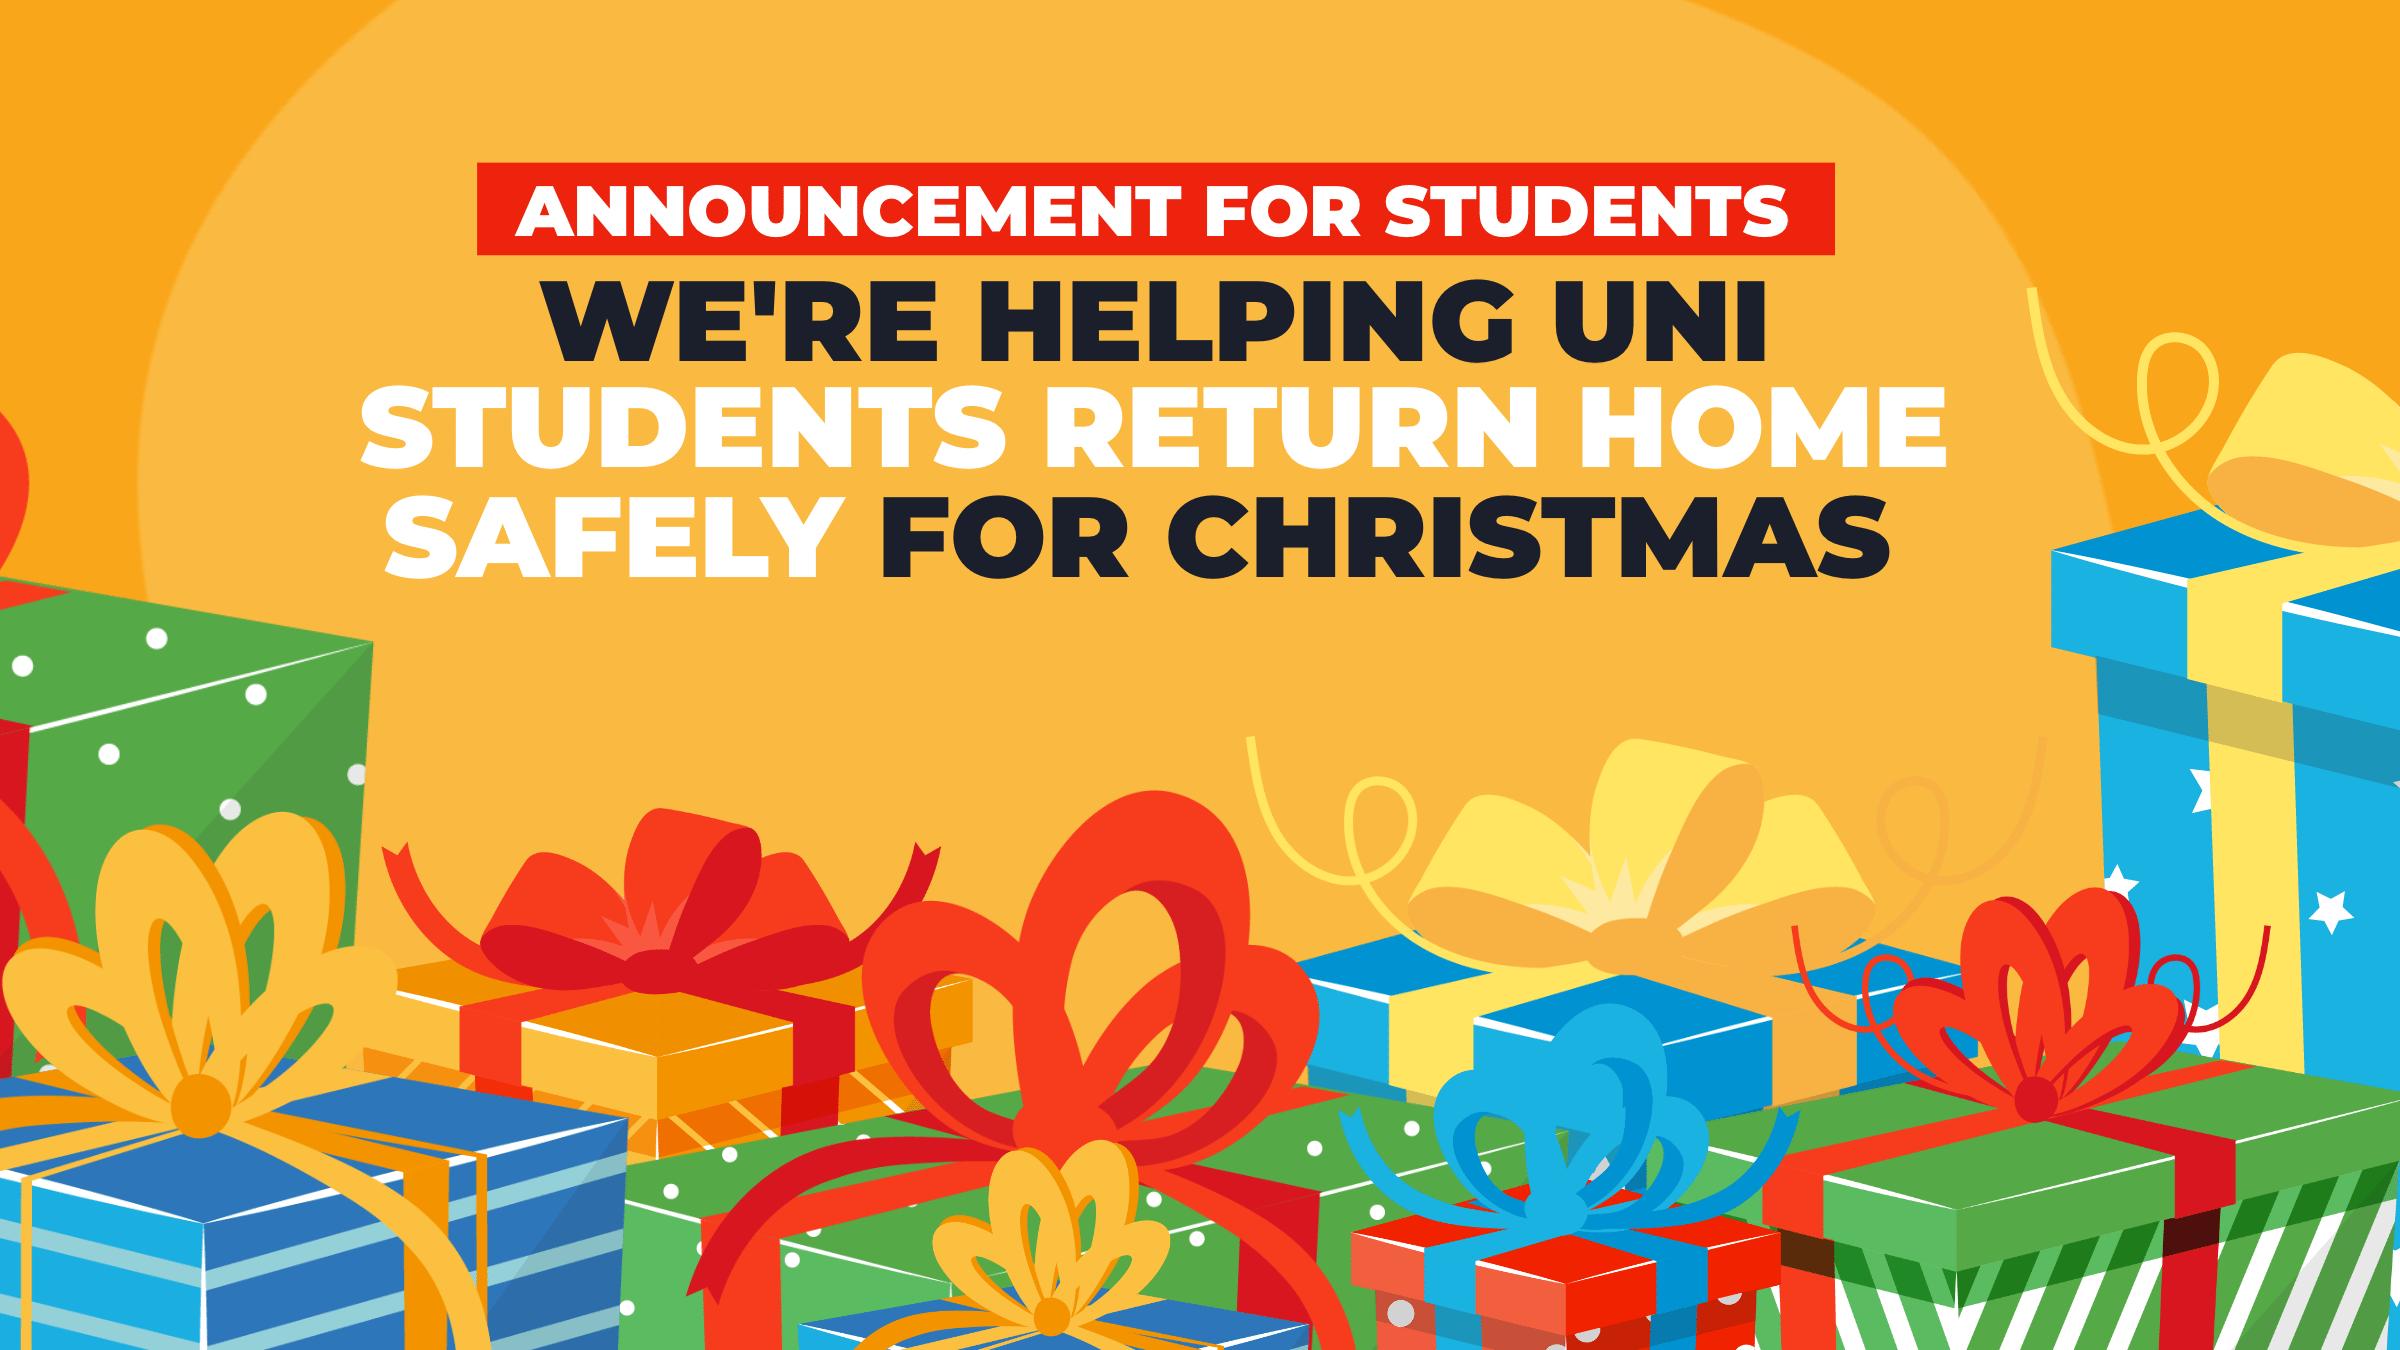 Welsh Lib Dem Education Minister announces Christmas travel plans for students